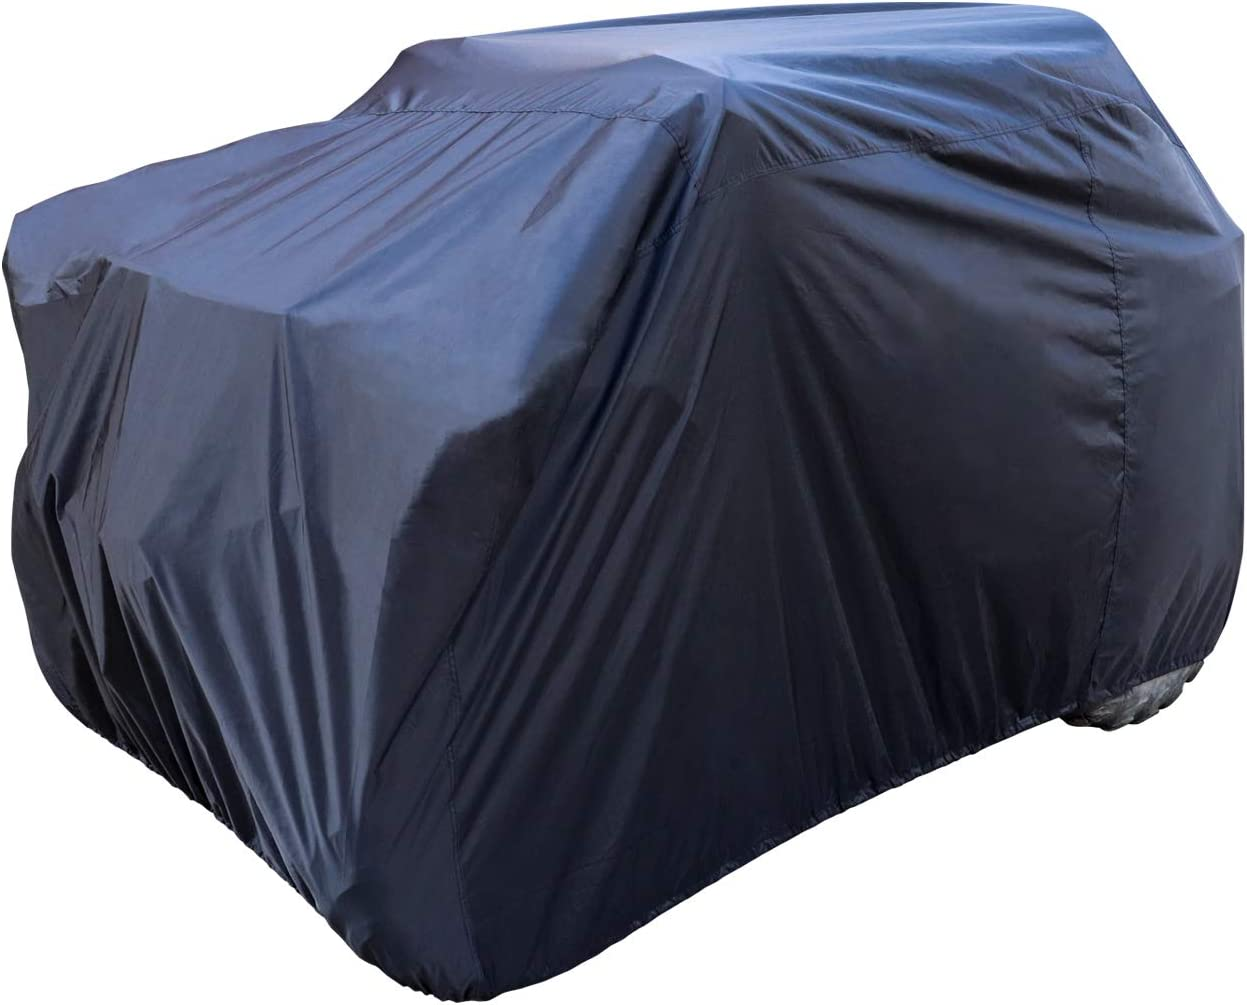 Basics Weatherproof Standard ATV Cover ATVs up to 290 cm 150D Oxford